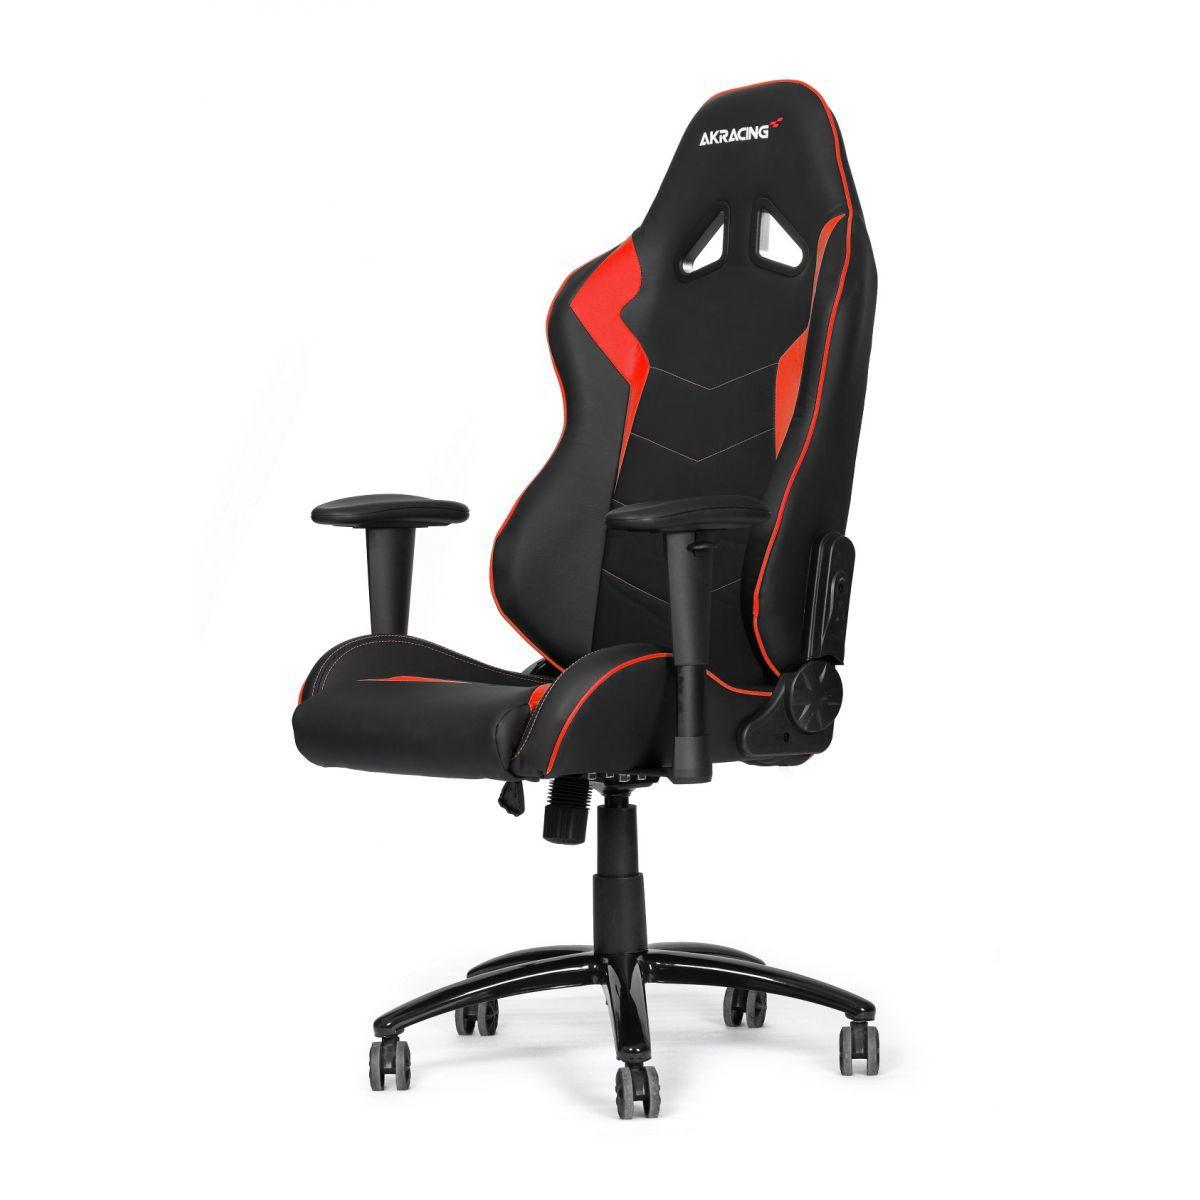 Cadeira AKRacing Octane Gaming Red K702B AK-OCTANE-RD 10115-8 - AKRacing